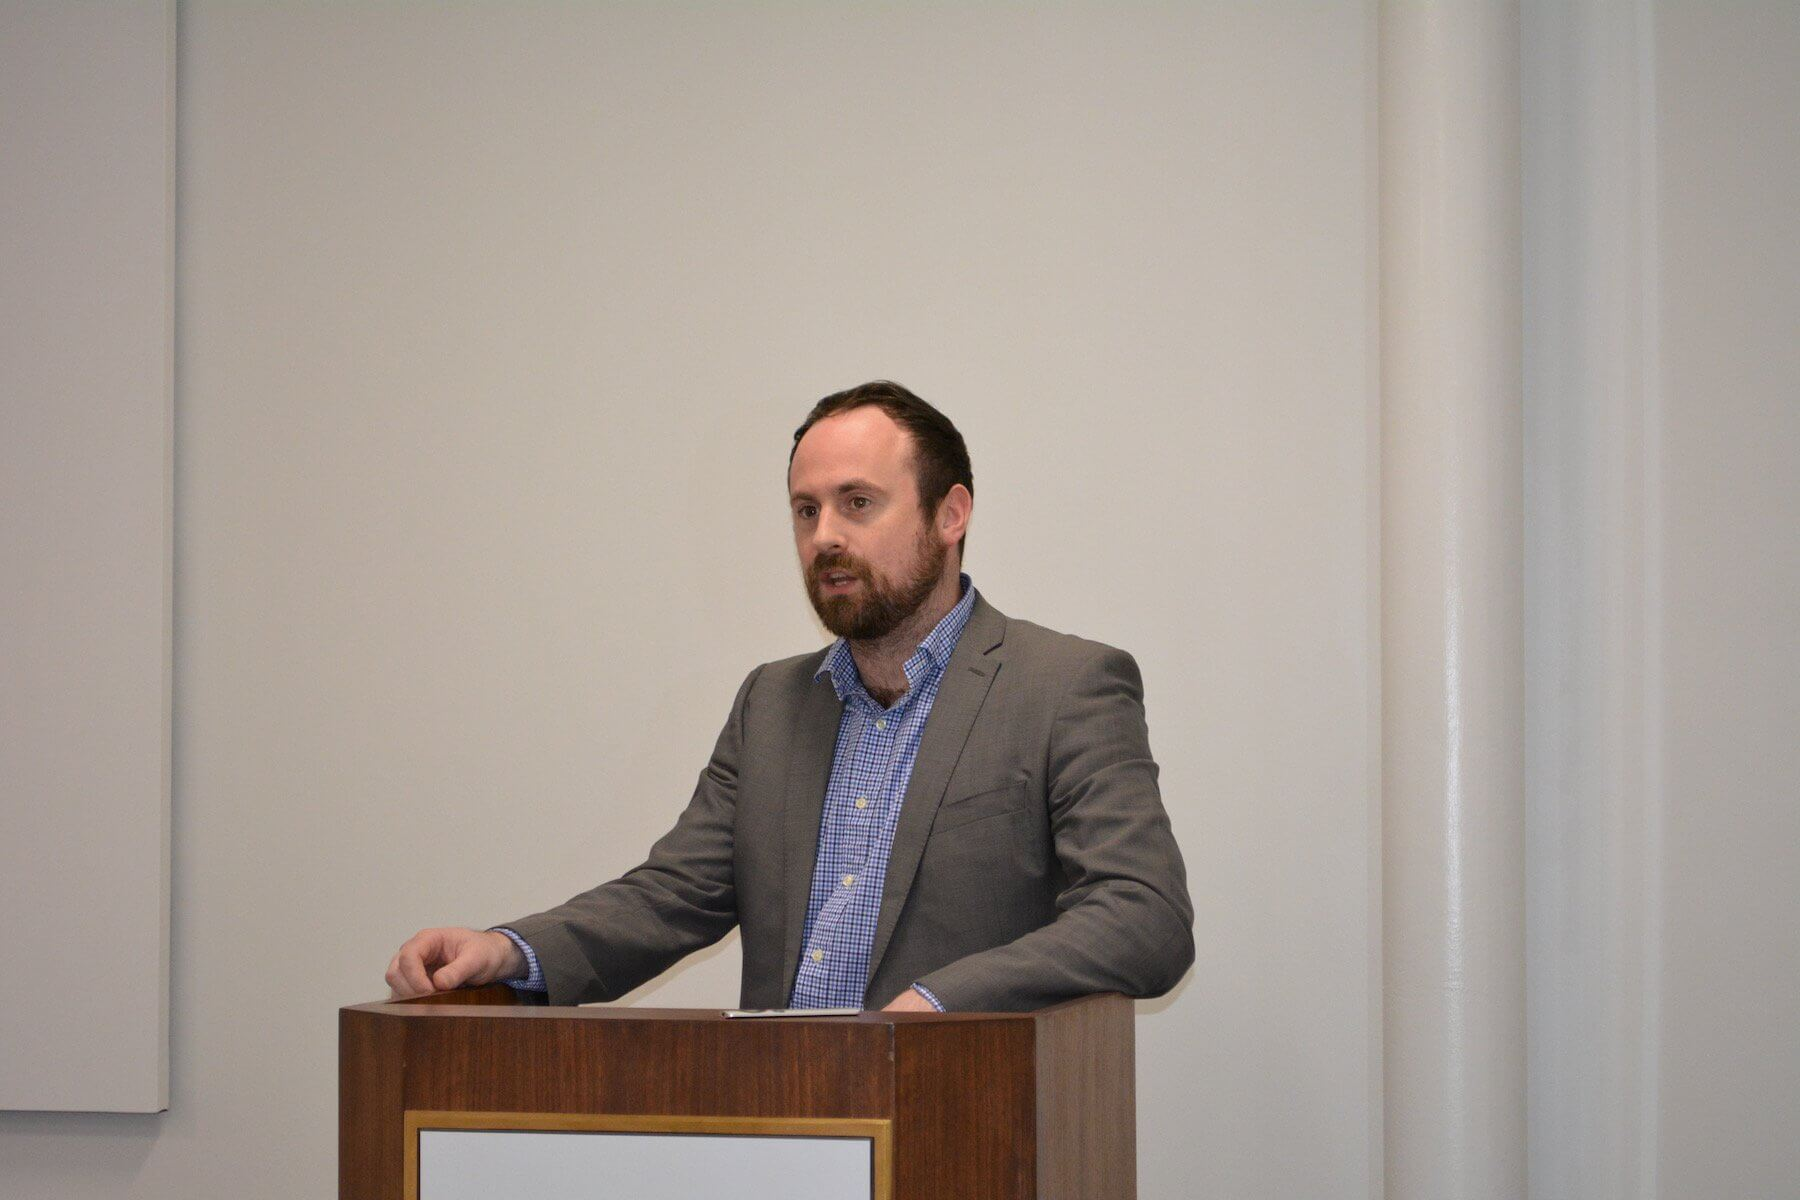 Stuart Corr, Ph.D., director of technology development at Baylor College of Medicine, led the hackathon.